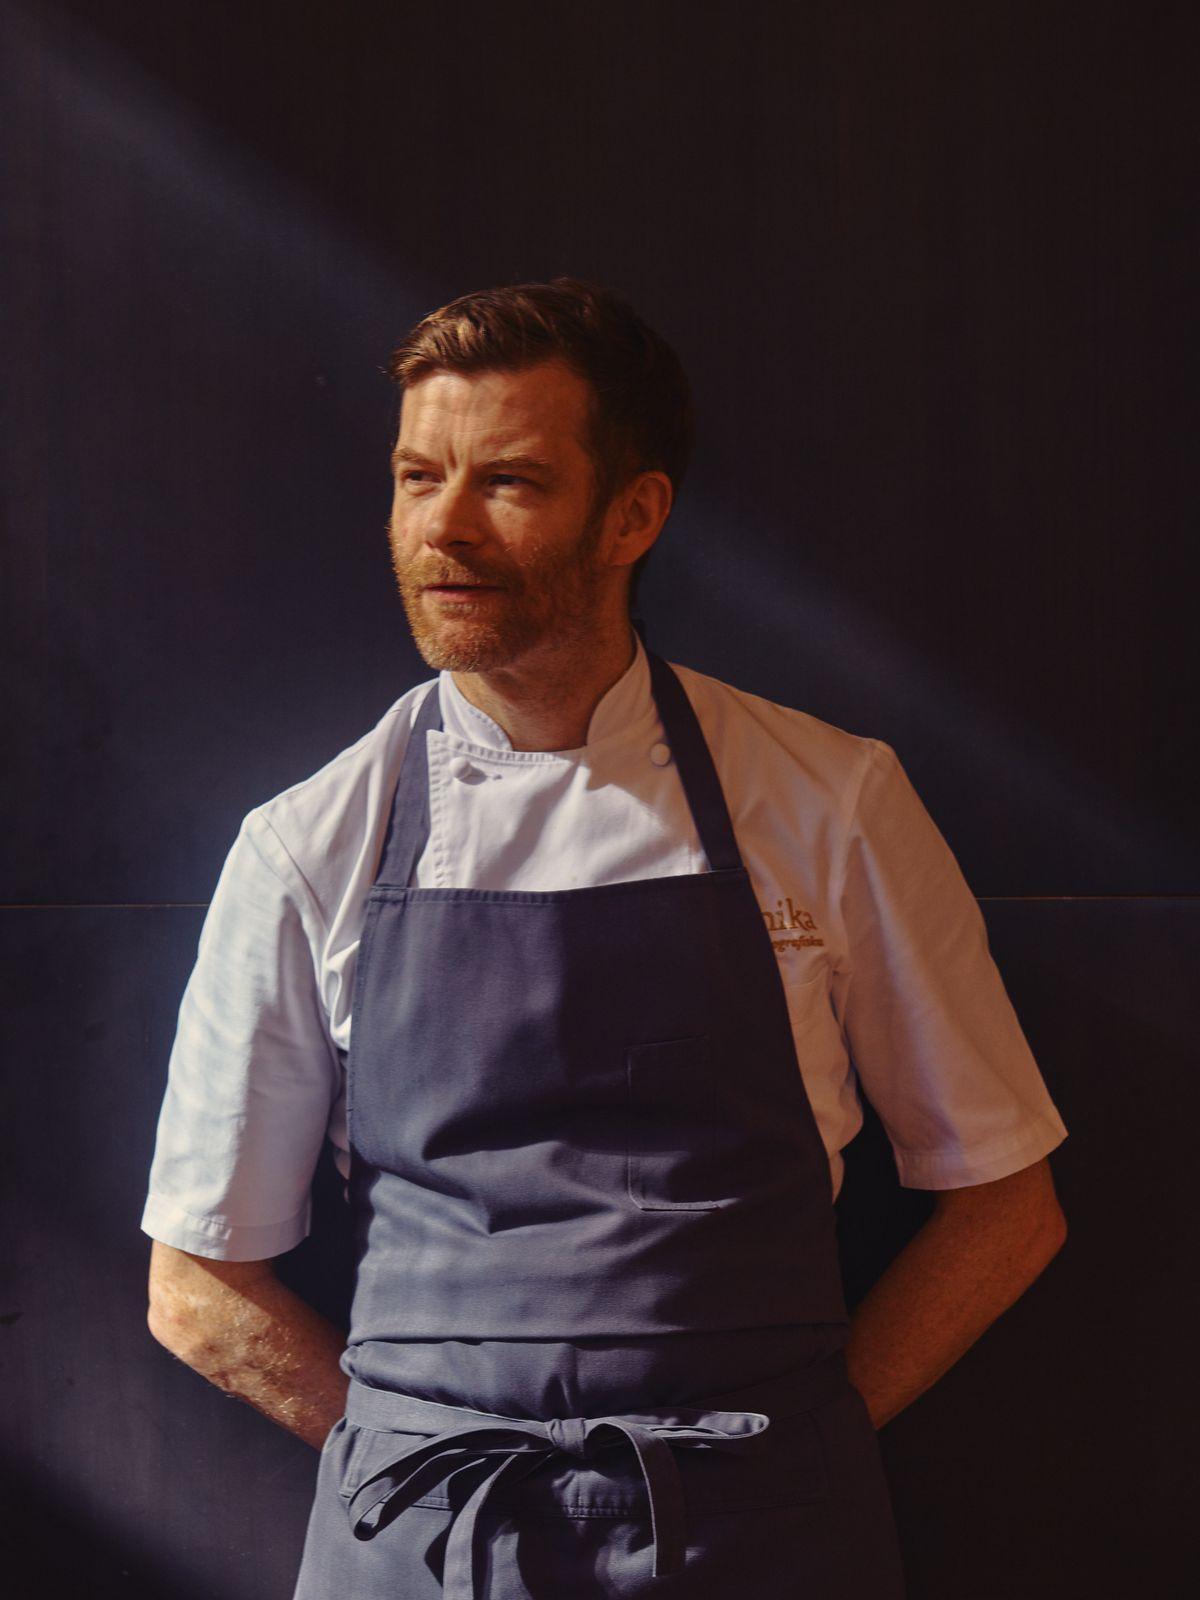 Robert Aikens wears an apron and a white shirt, against a black wall.